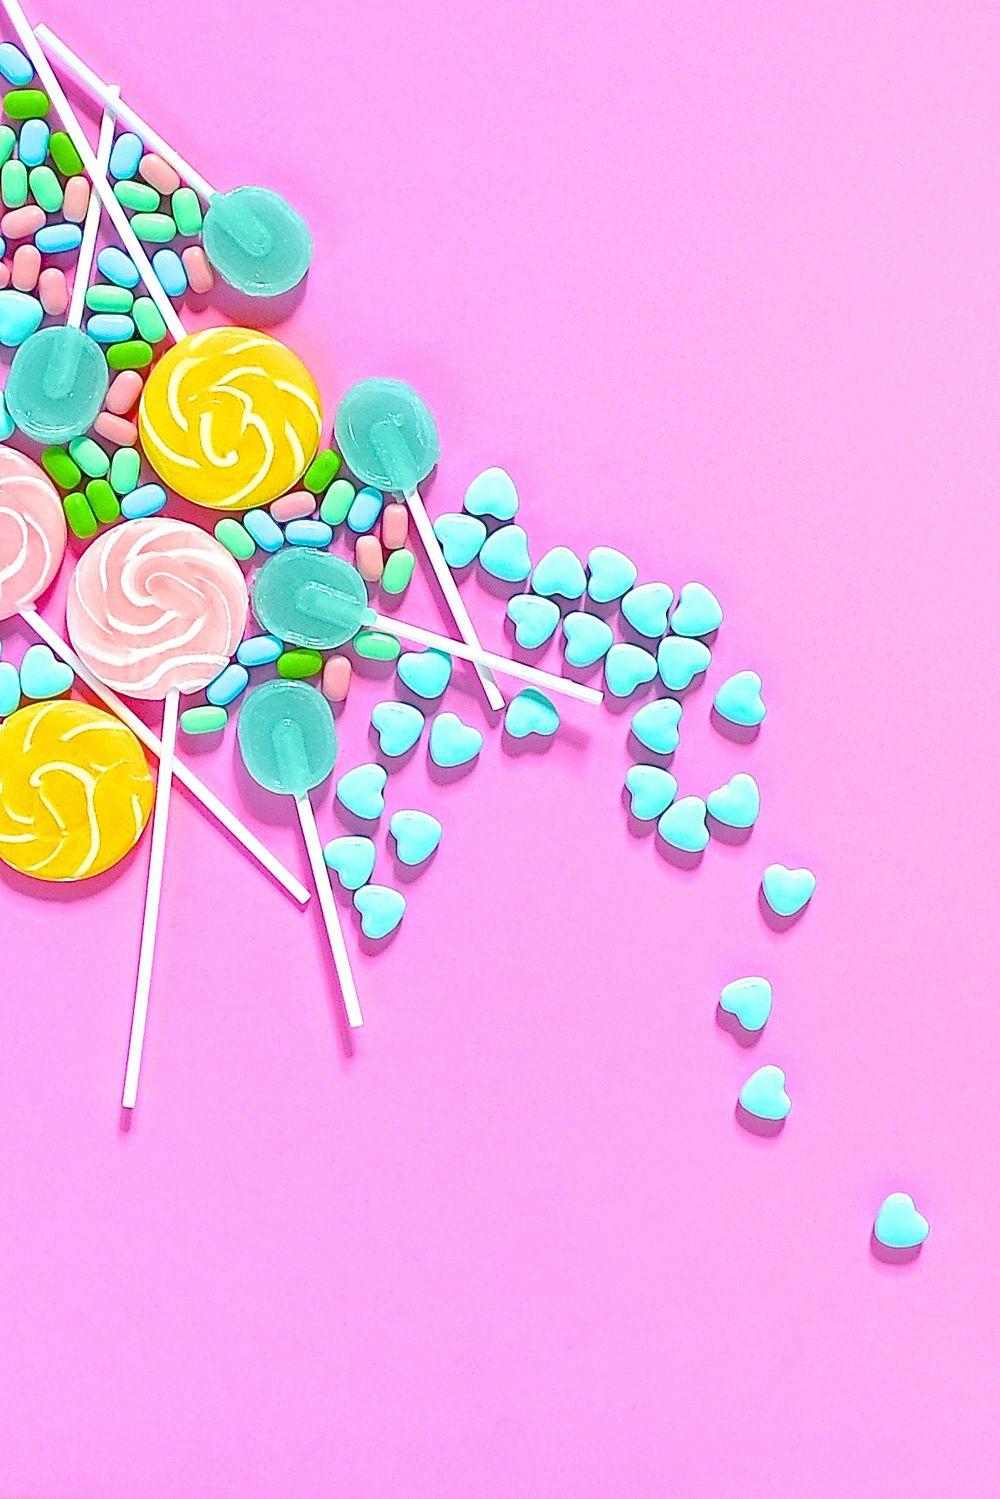 Sweet As Sugar  Wallpaper Download Violet Tinder Studios Candy 1000x1499